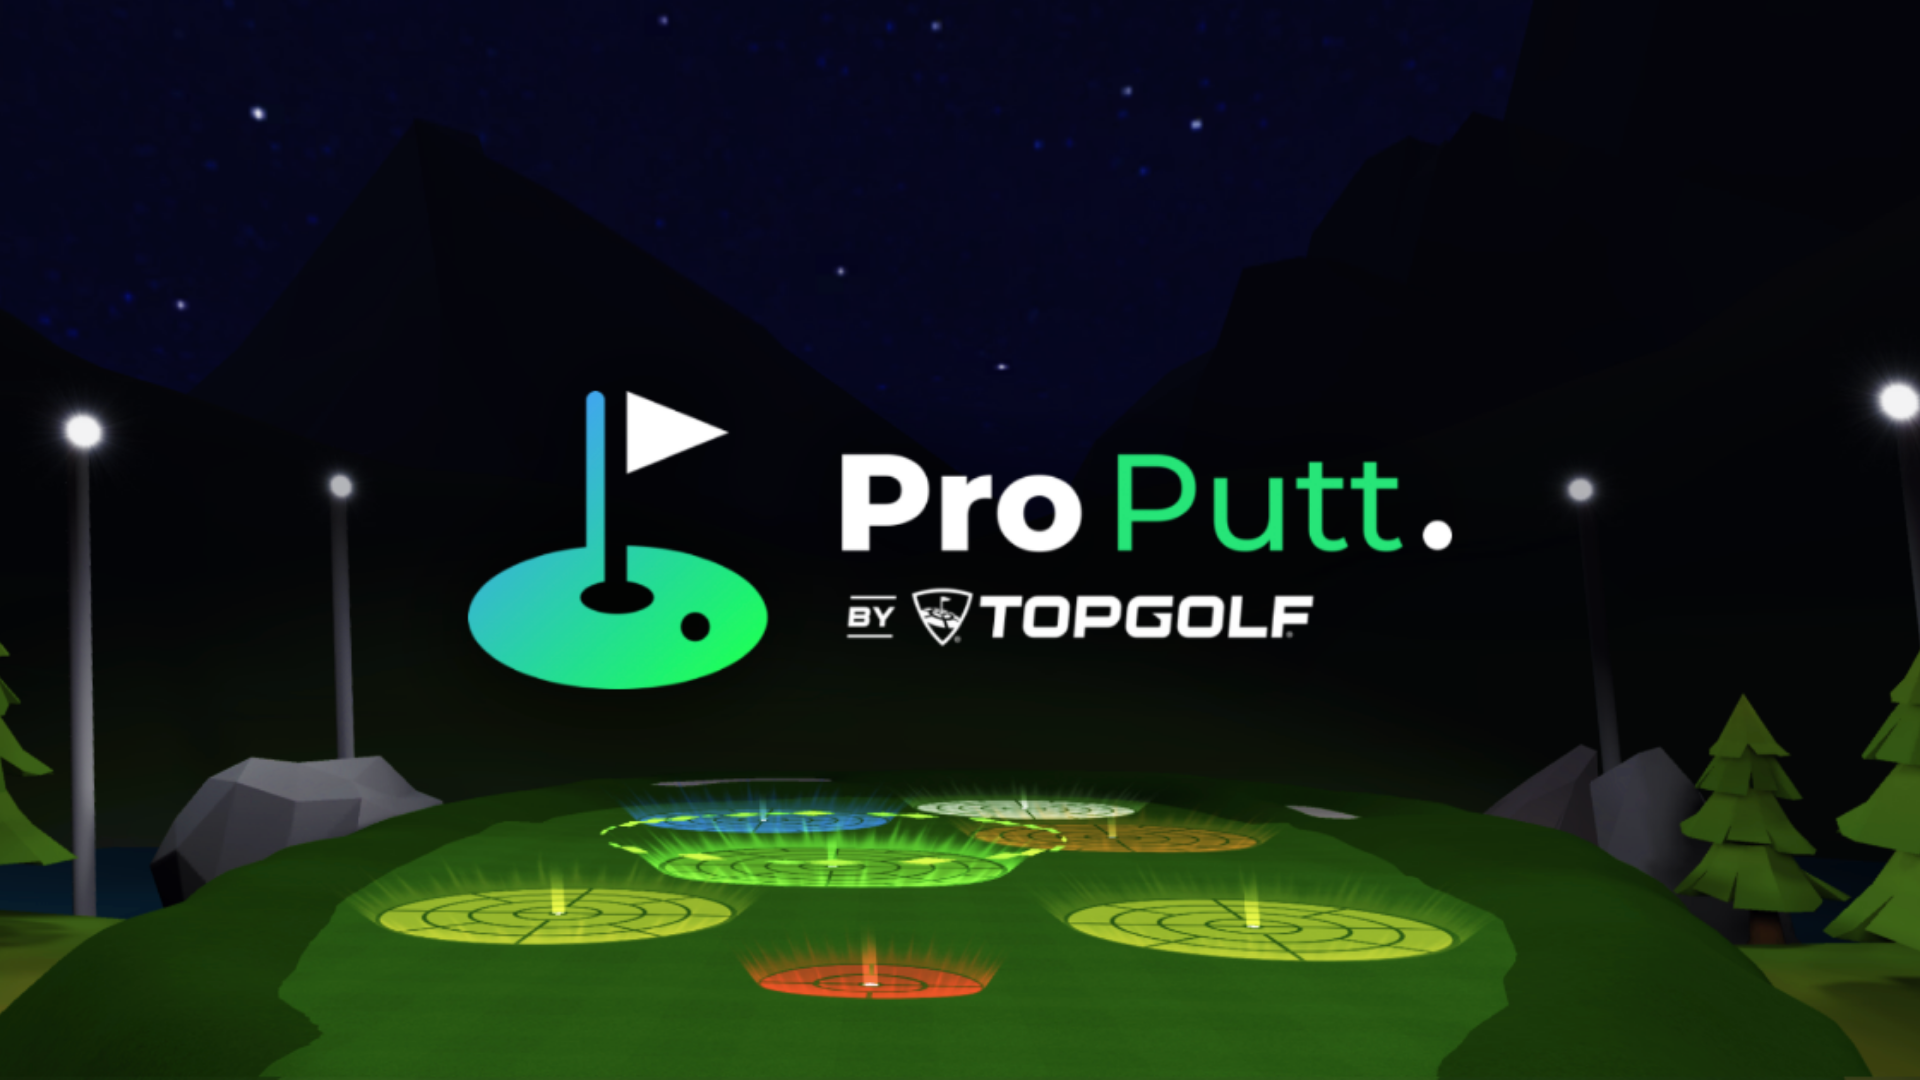 Pro Putt by Topgolf